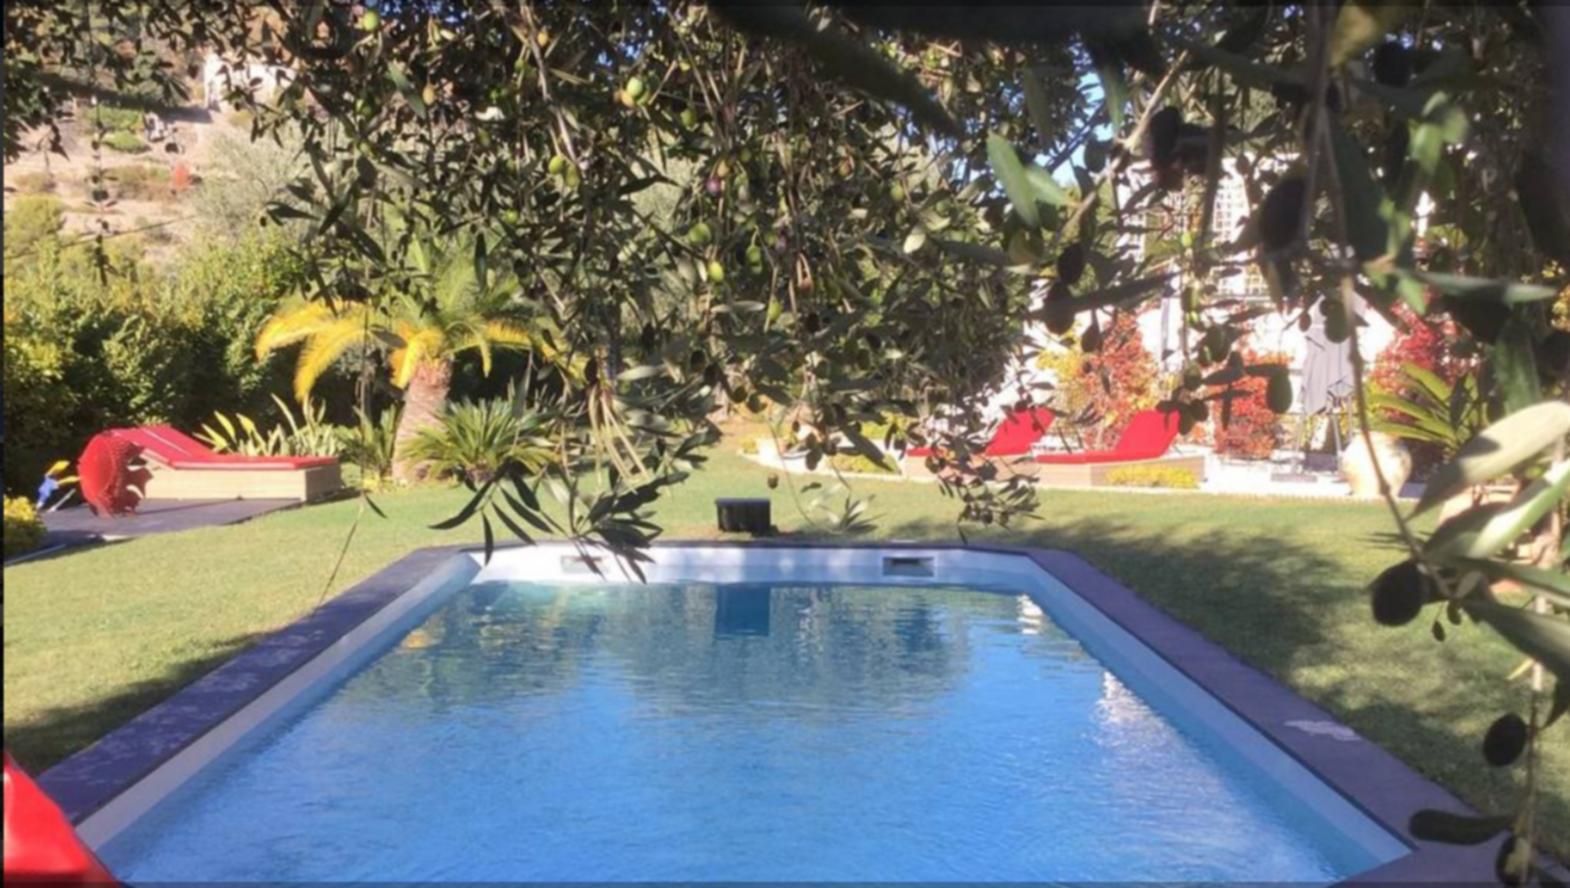 A person in a pool at Mas de Provence en Riviera.